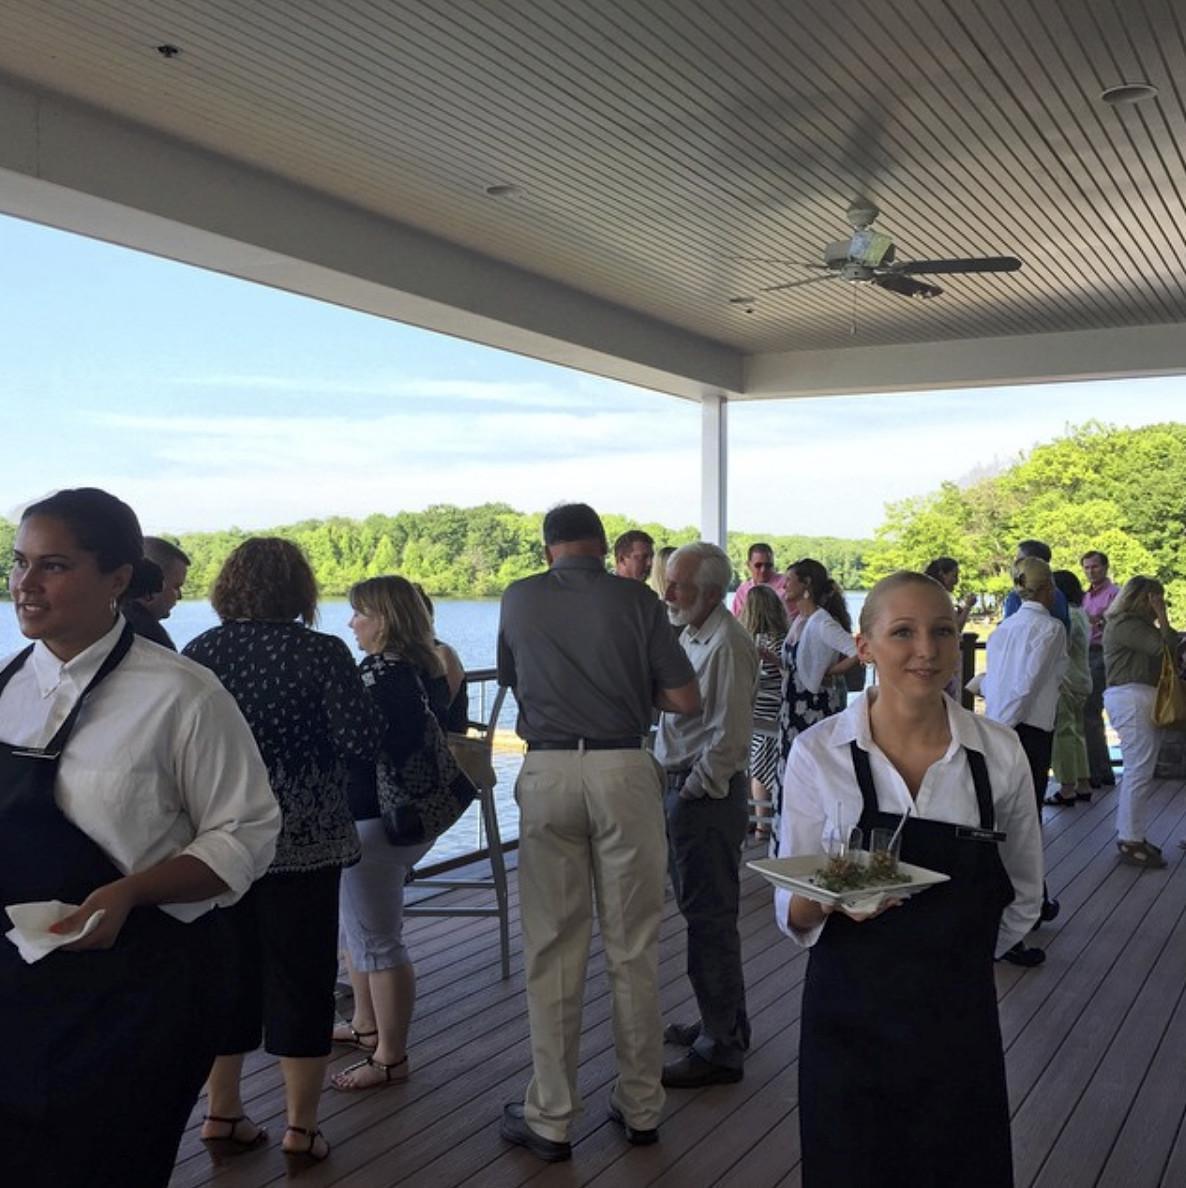 Celebrate at The Boathouse at Mercer Lake